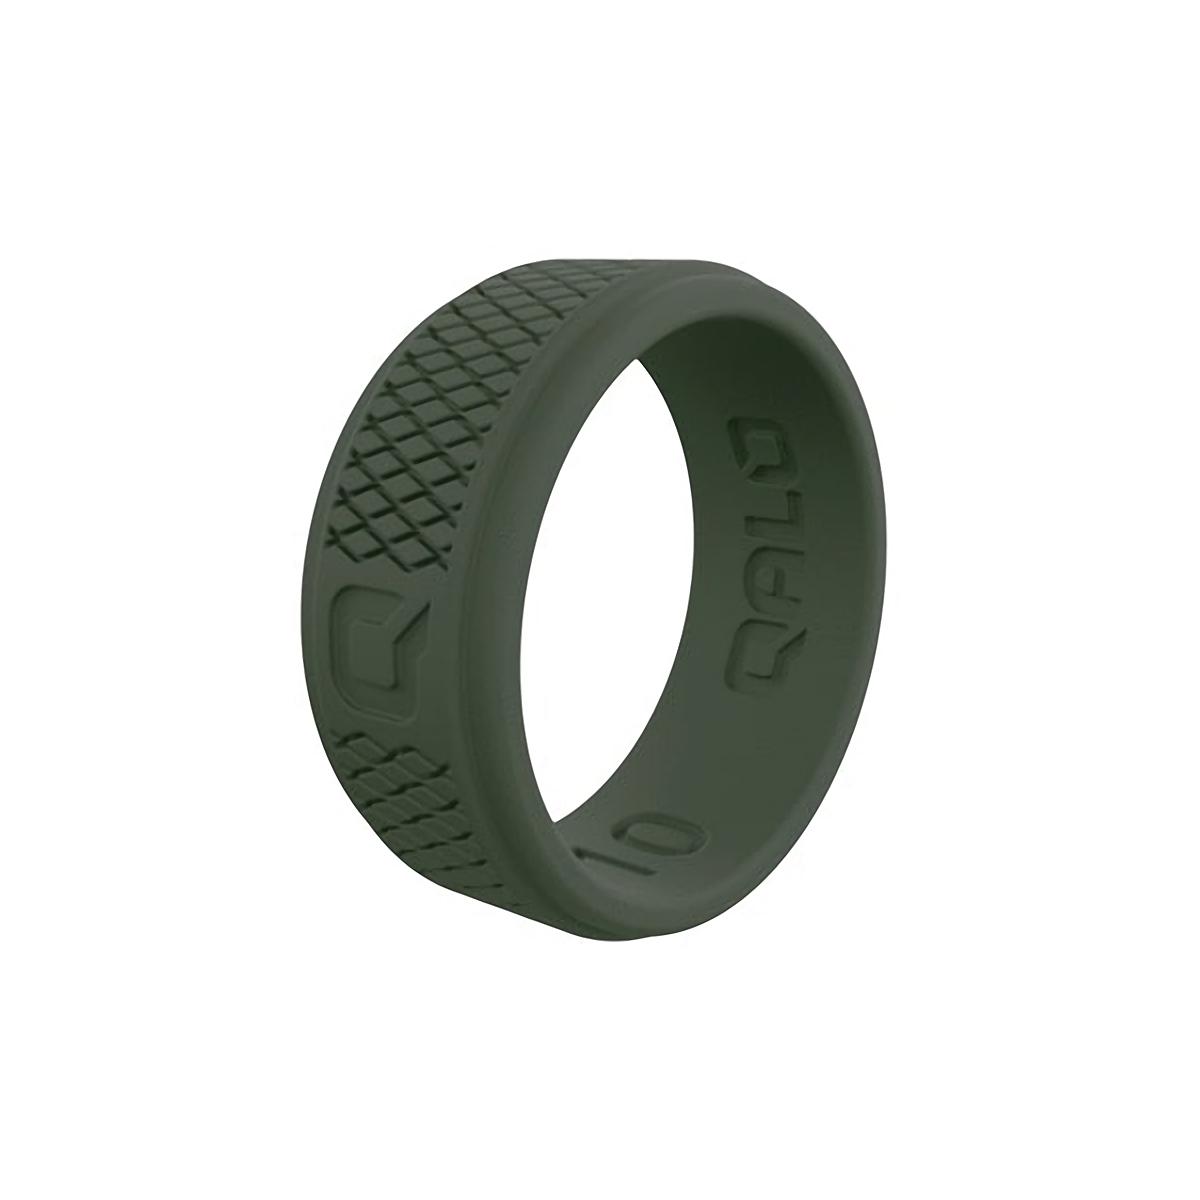 Men's Qalo Crosshatch Silicone Ring - Color: Sage - Size: 9, Sage, large, image 1